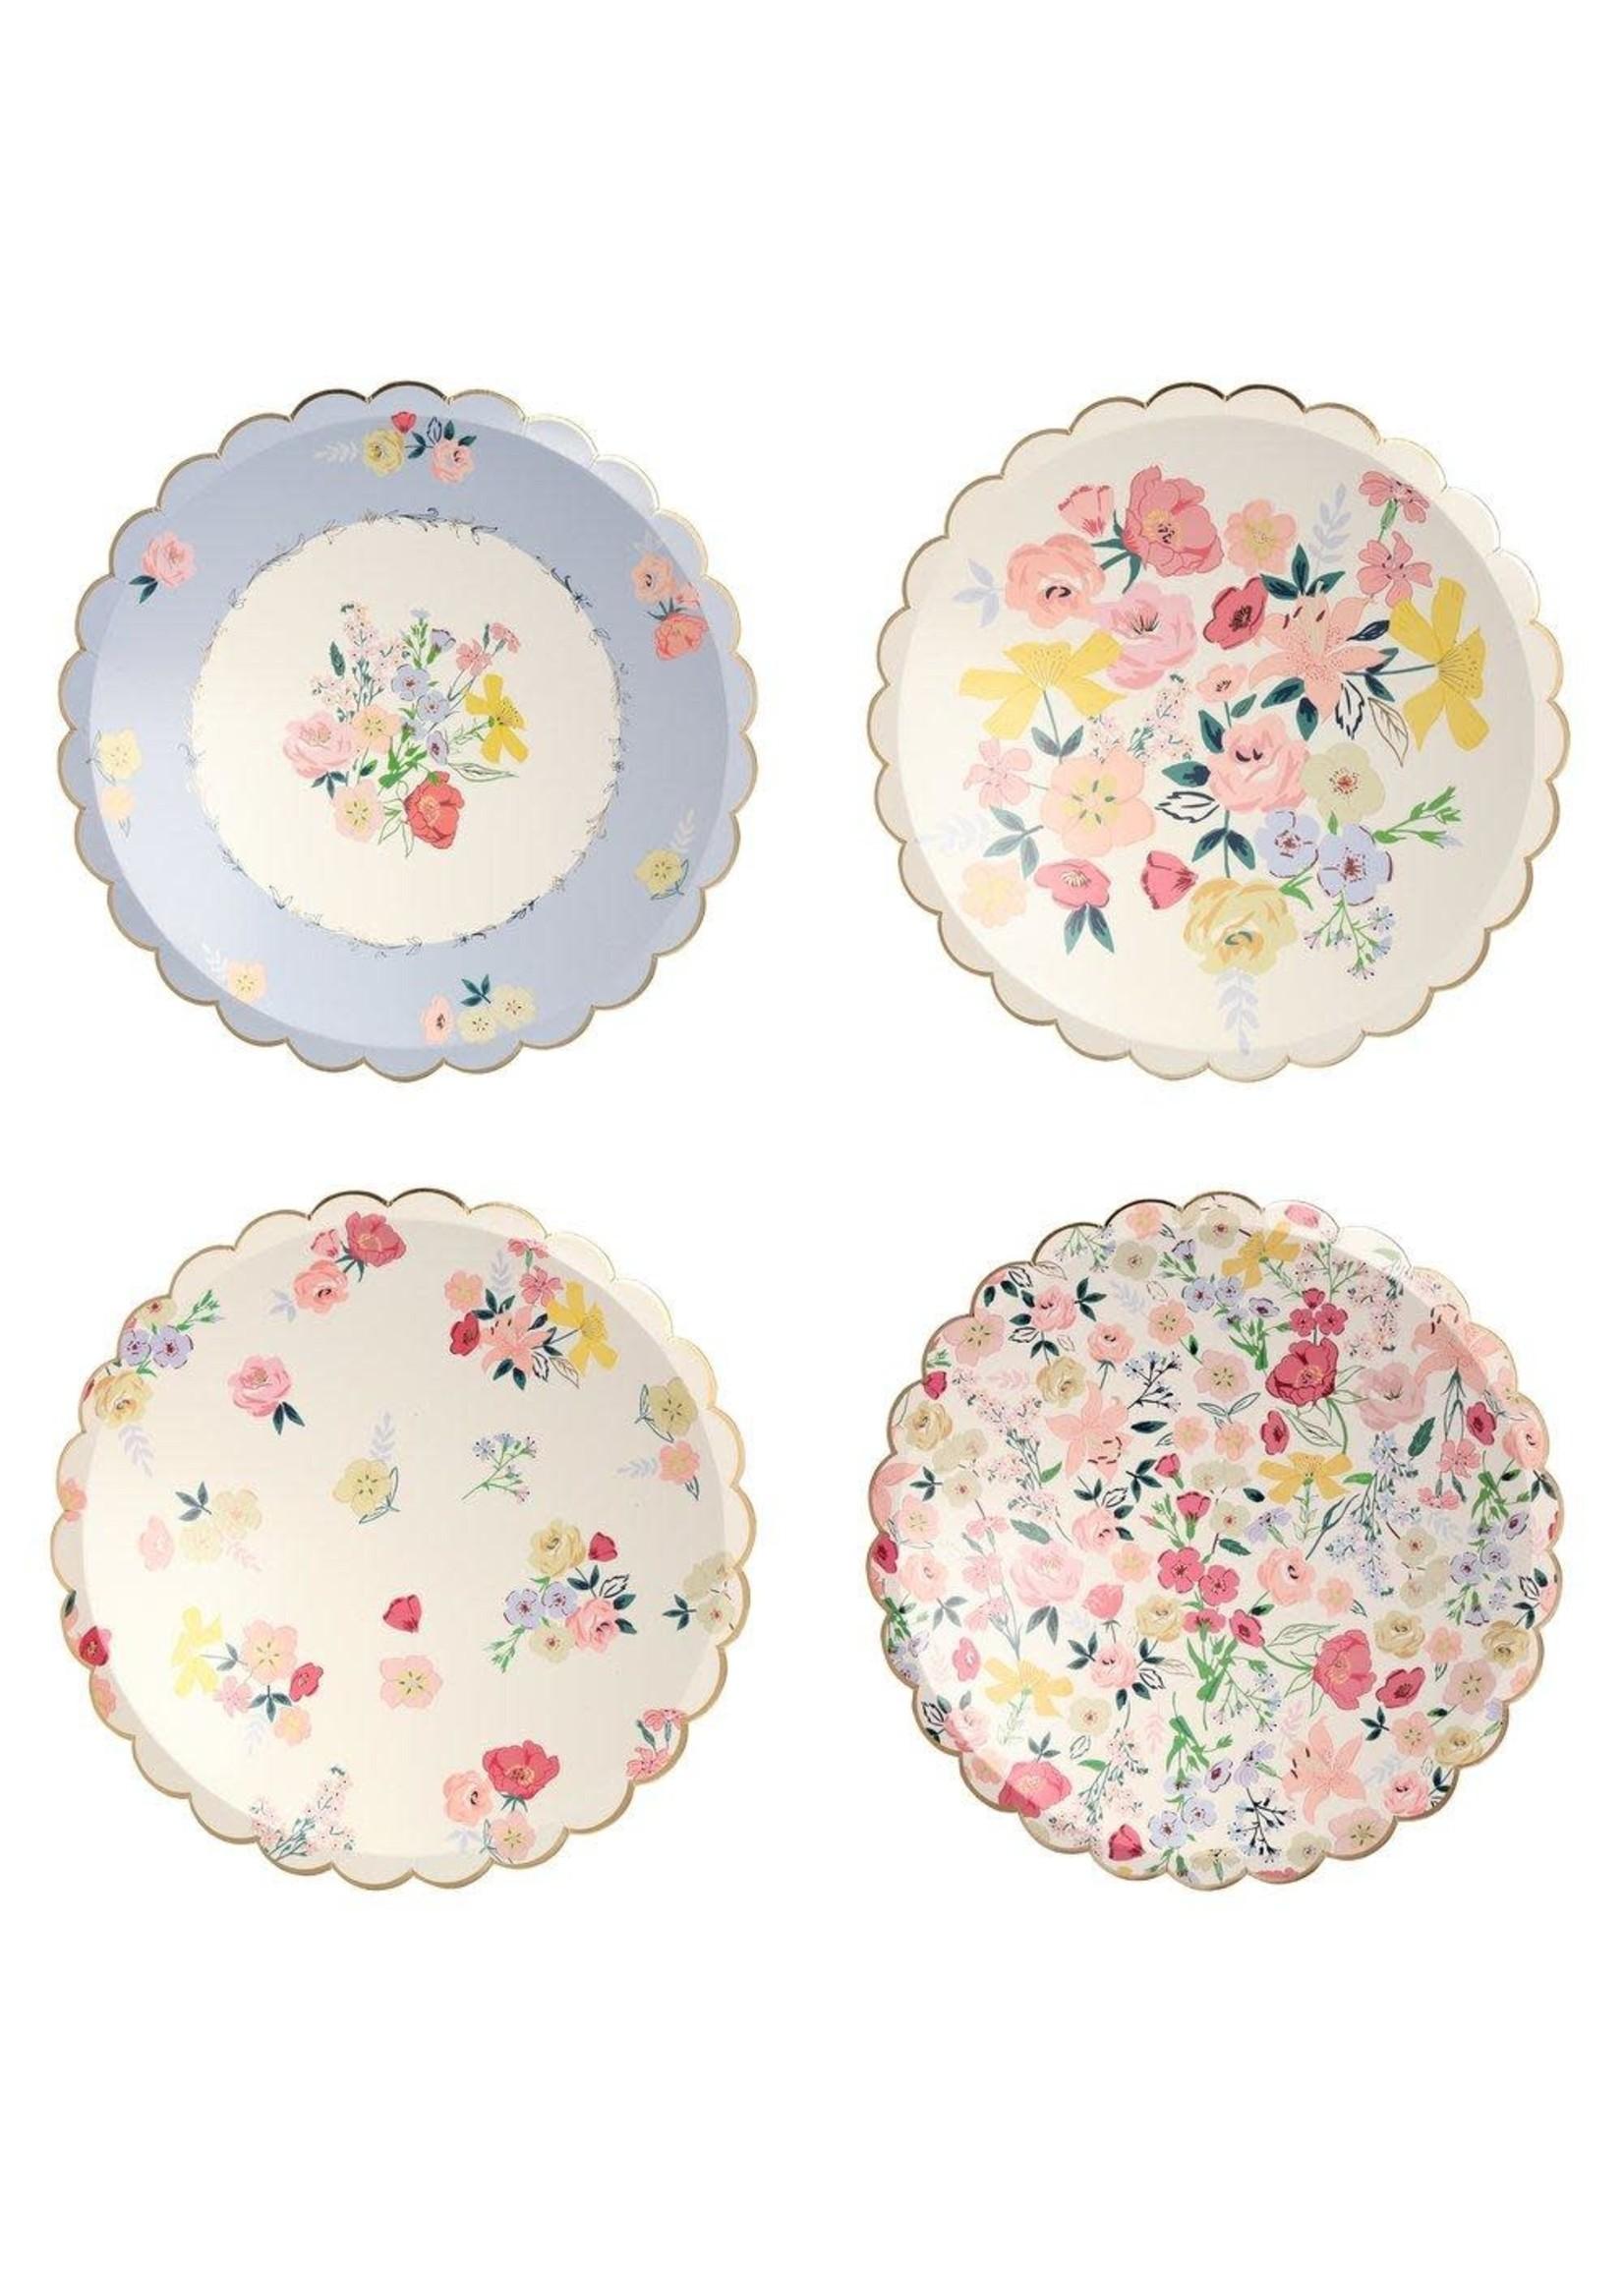 Meri Meri Paper Plates Dinner - English Garden